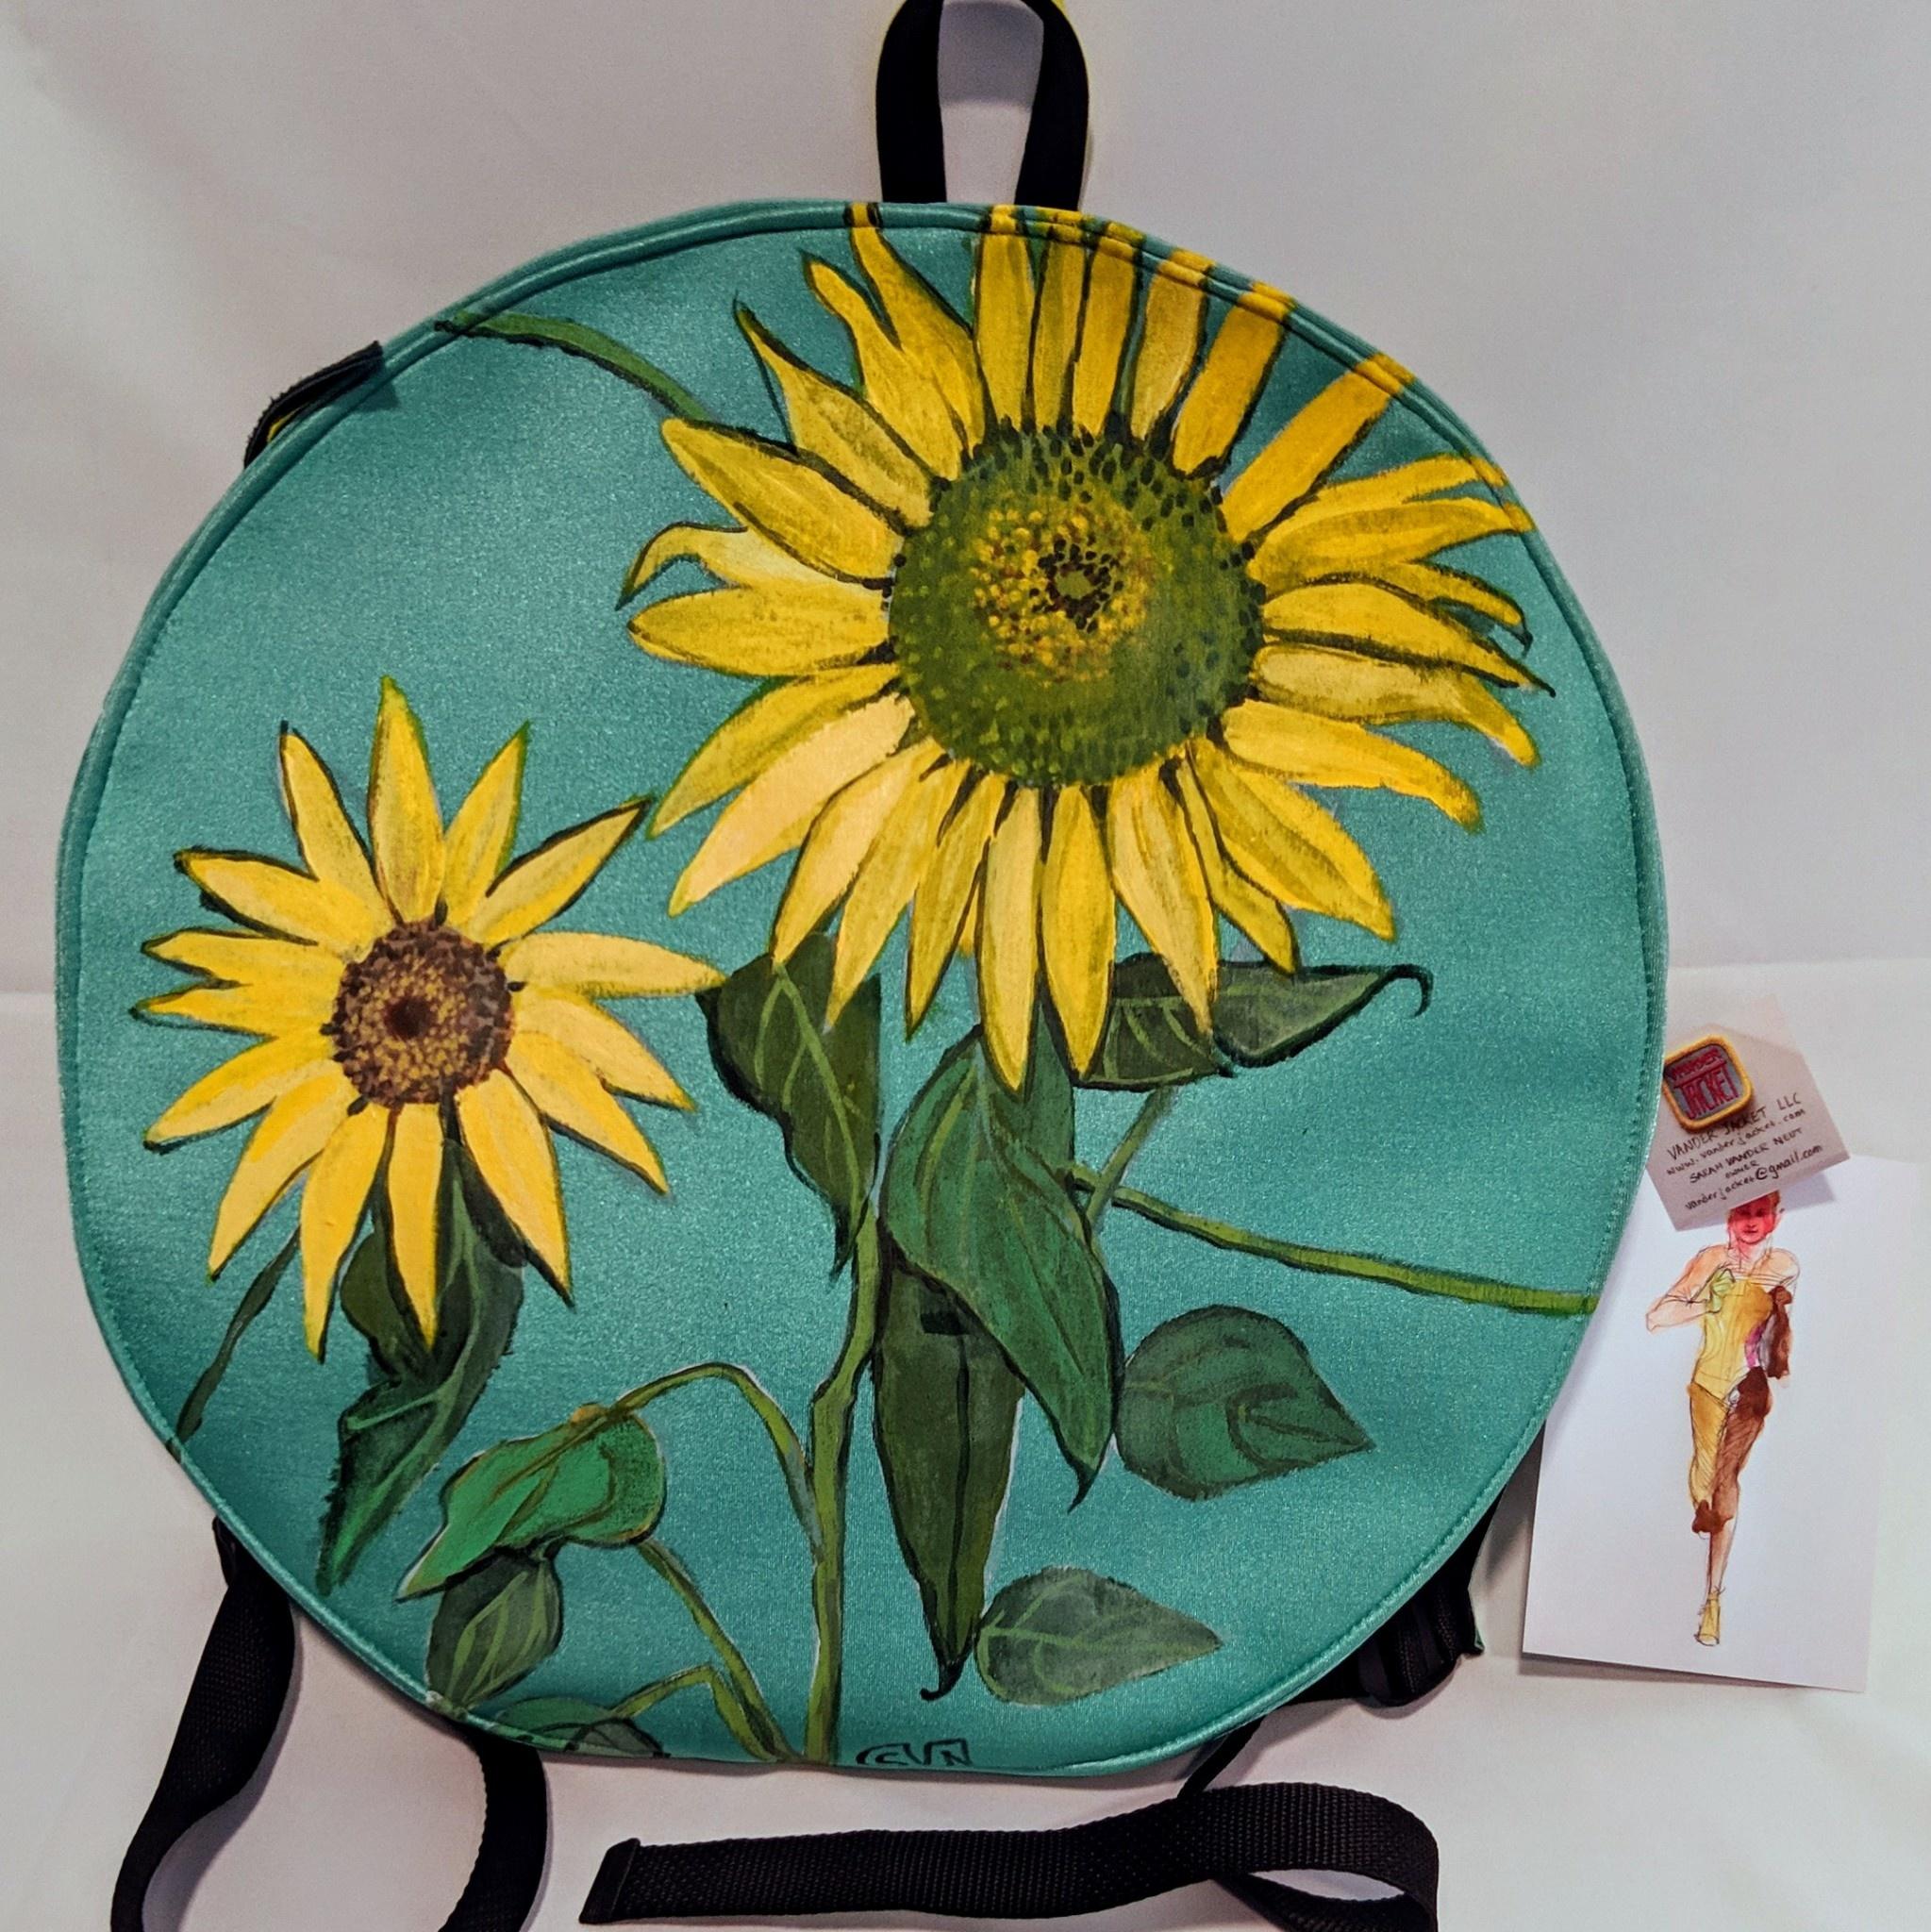 Sarah Vanderneut Neoprene Backpack Green - Hand Painted Floral Design